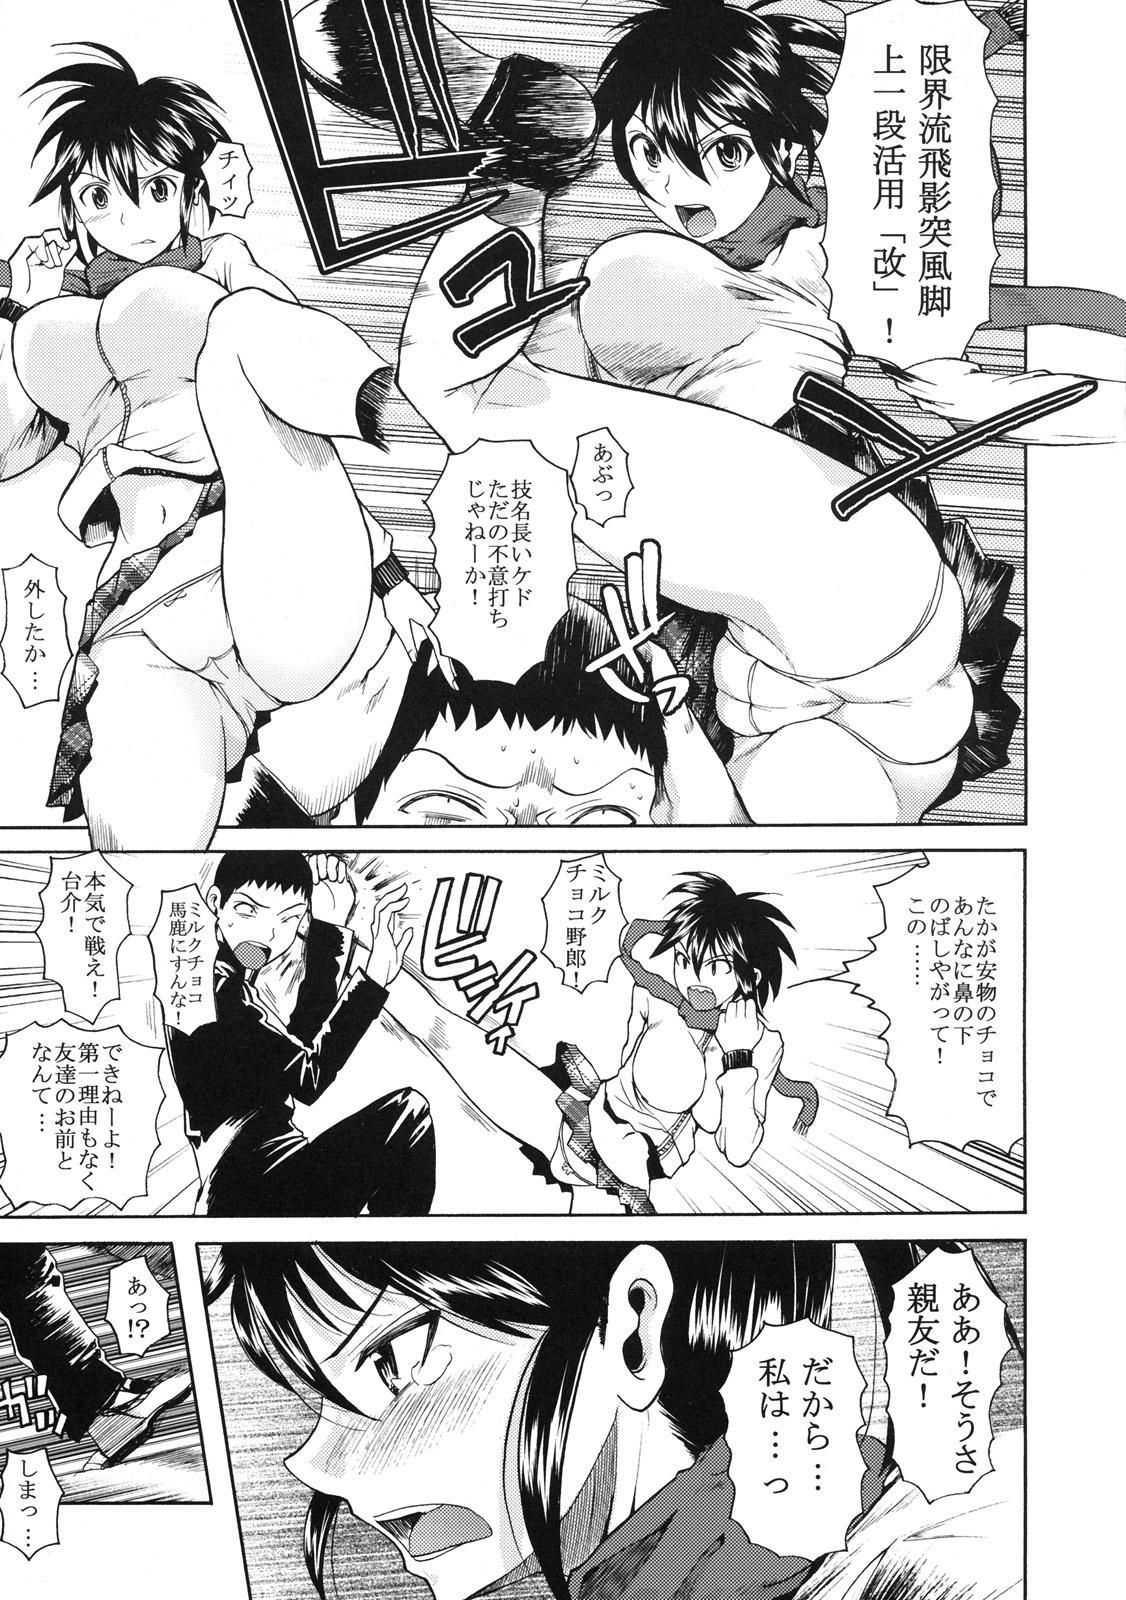 Shinzui Valentine Special Vol. 1 7